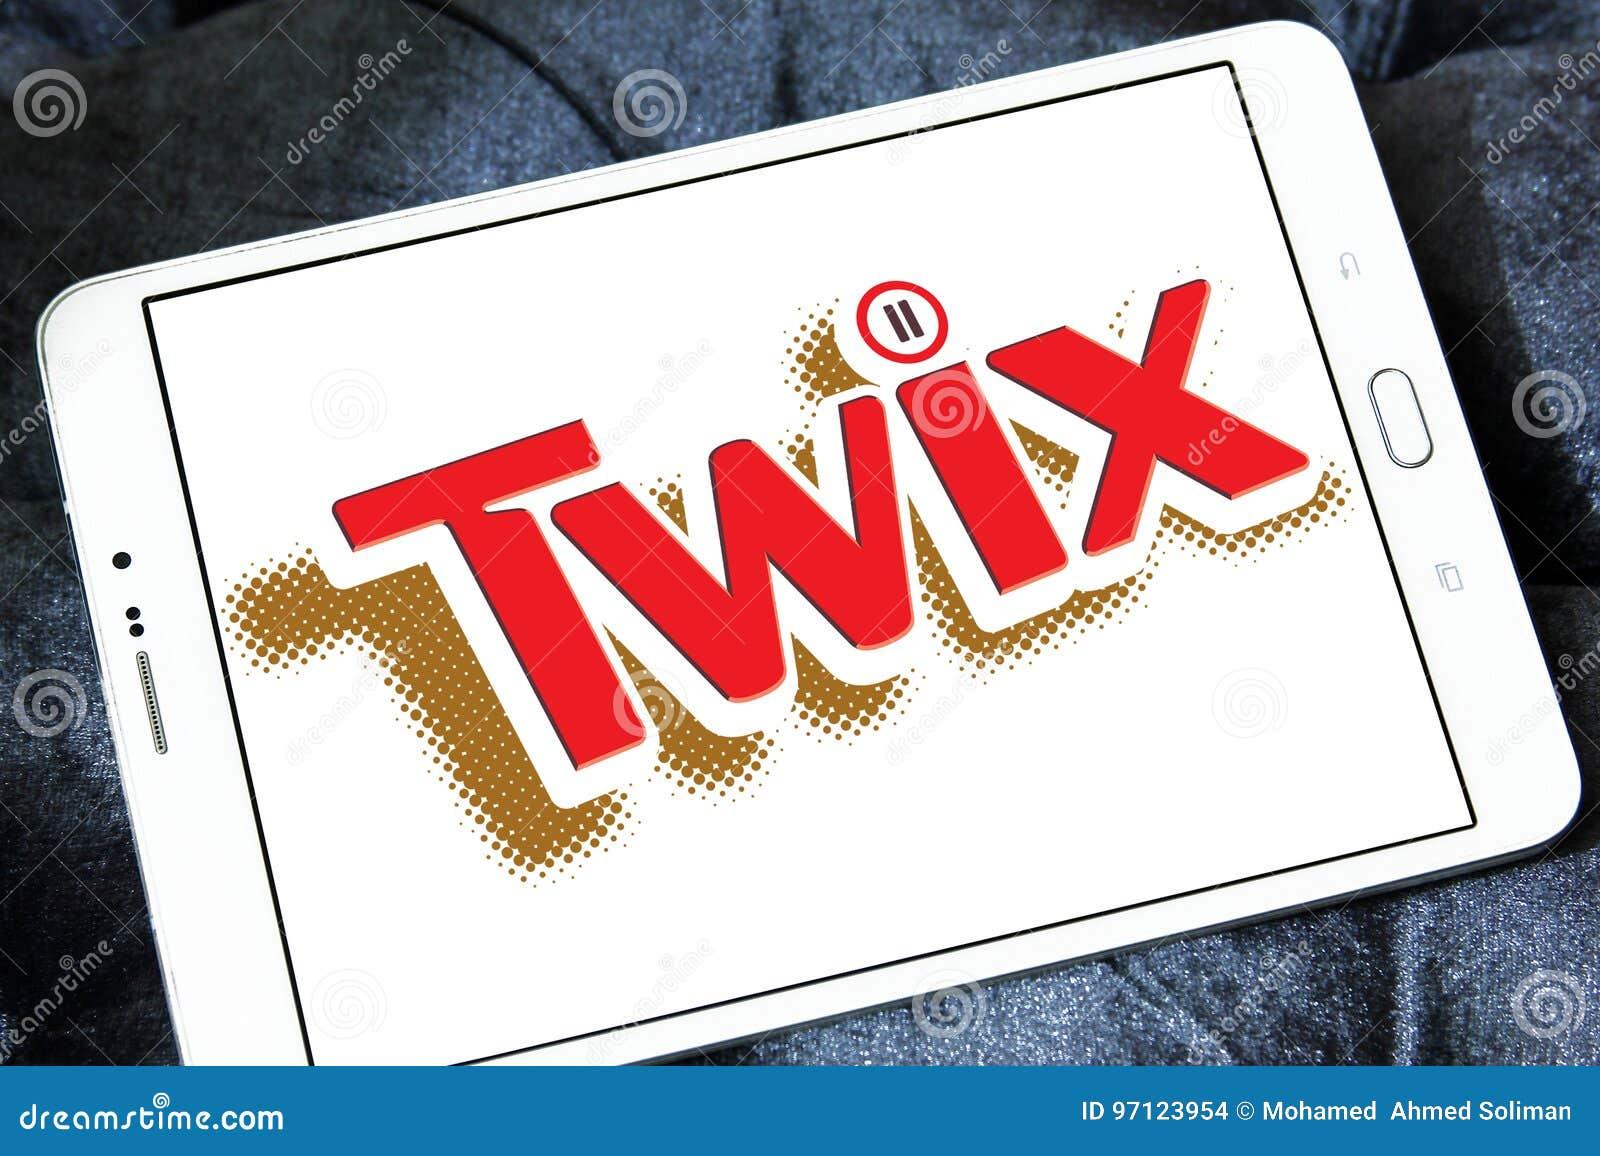 Twix chocolate brand logo editorial stock image  Image of